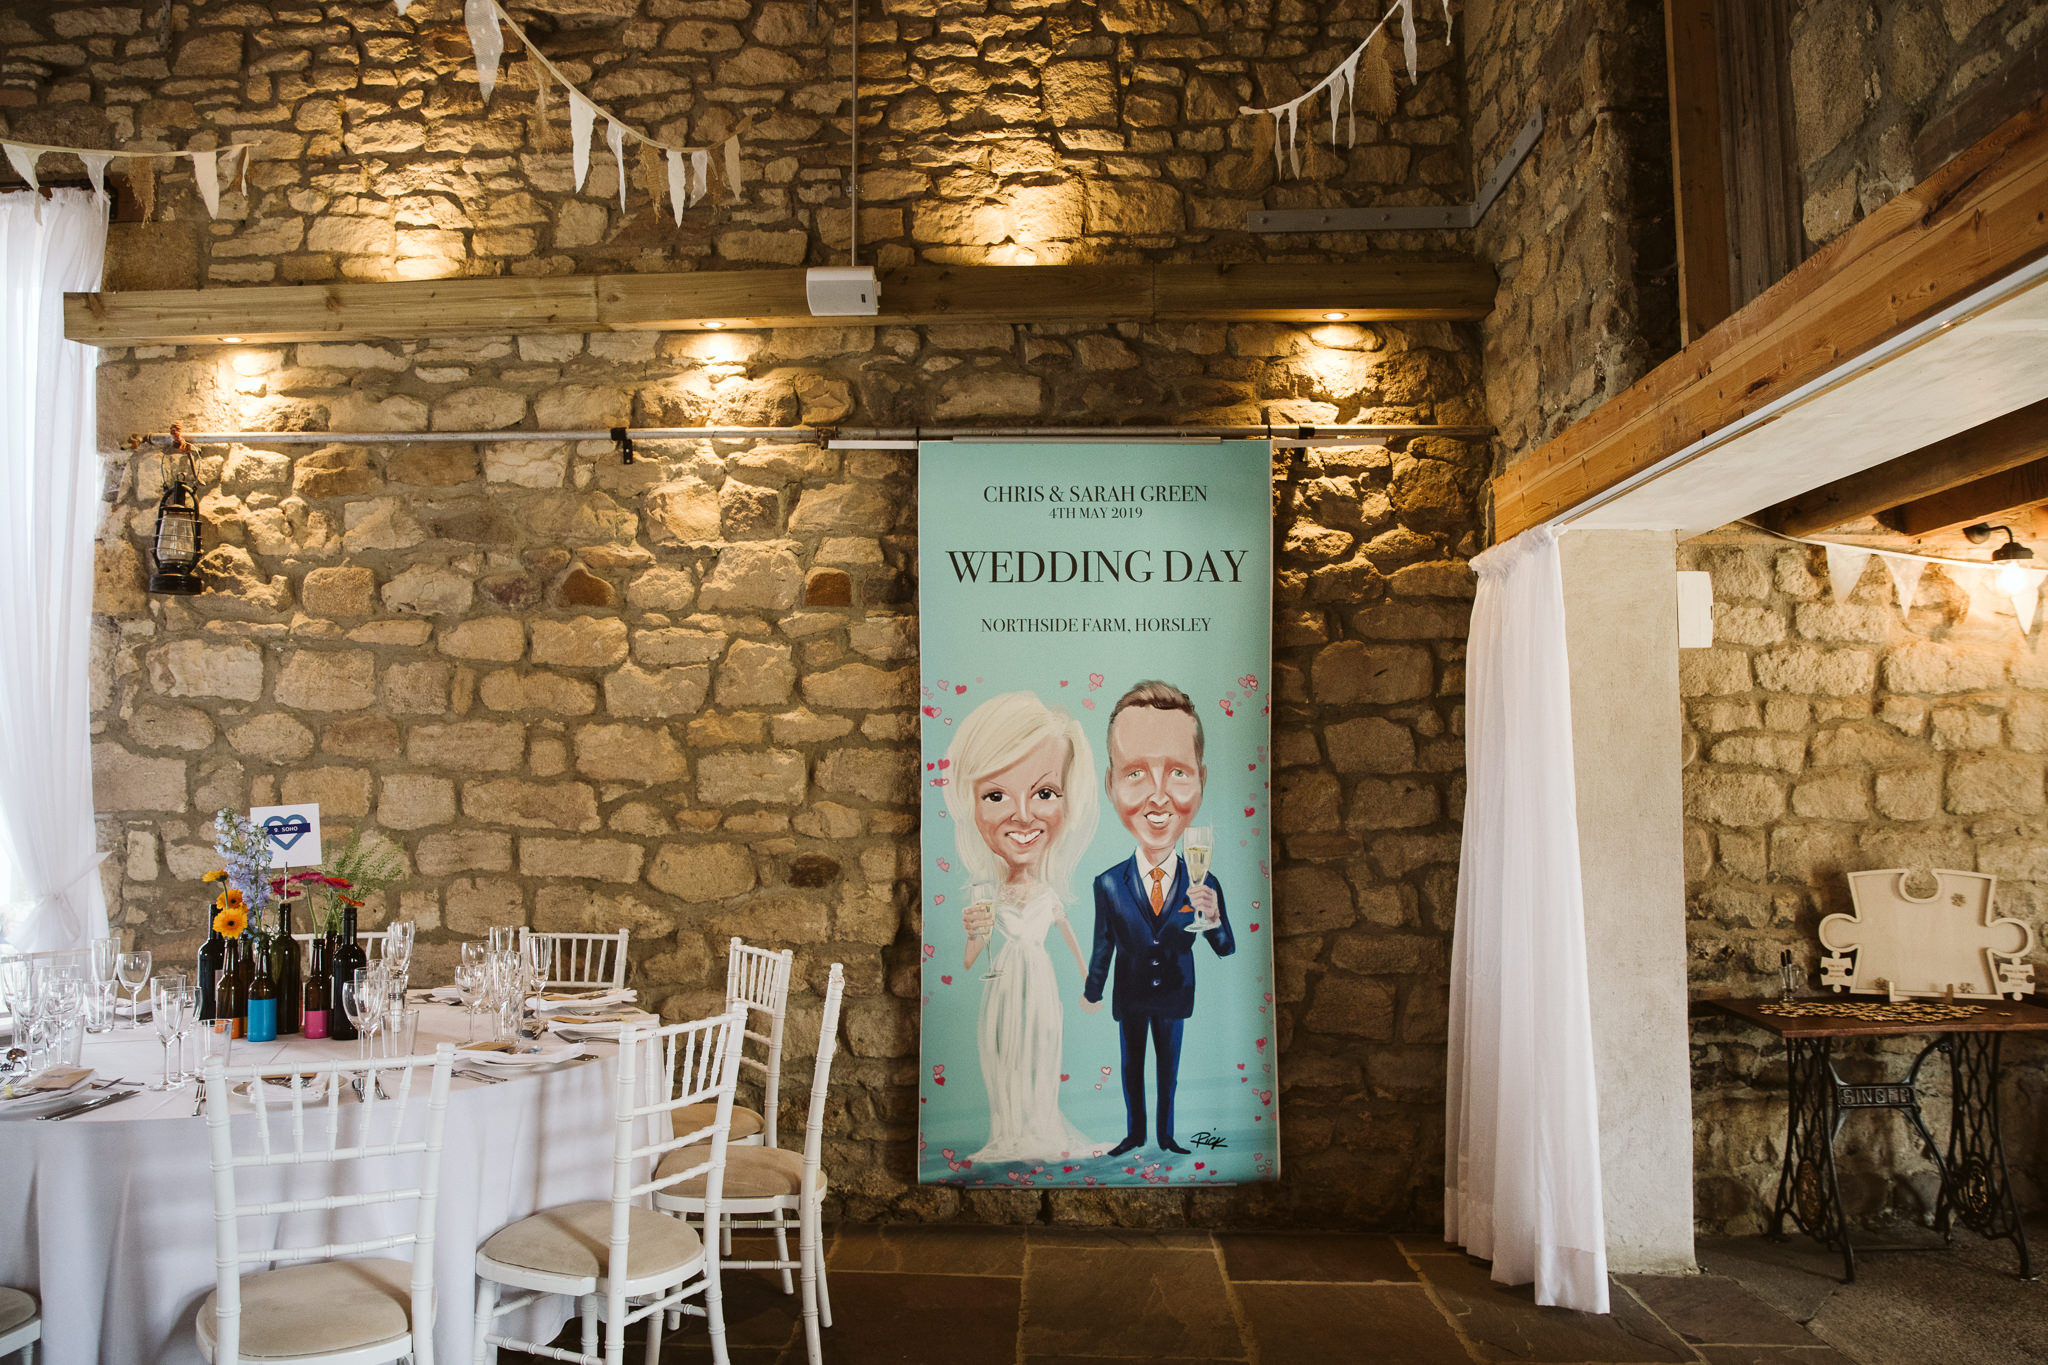 northside-farm-wedding-northumberland-margarita-hope (46).jpg